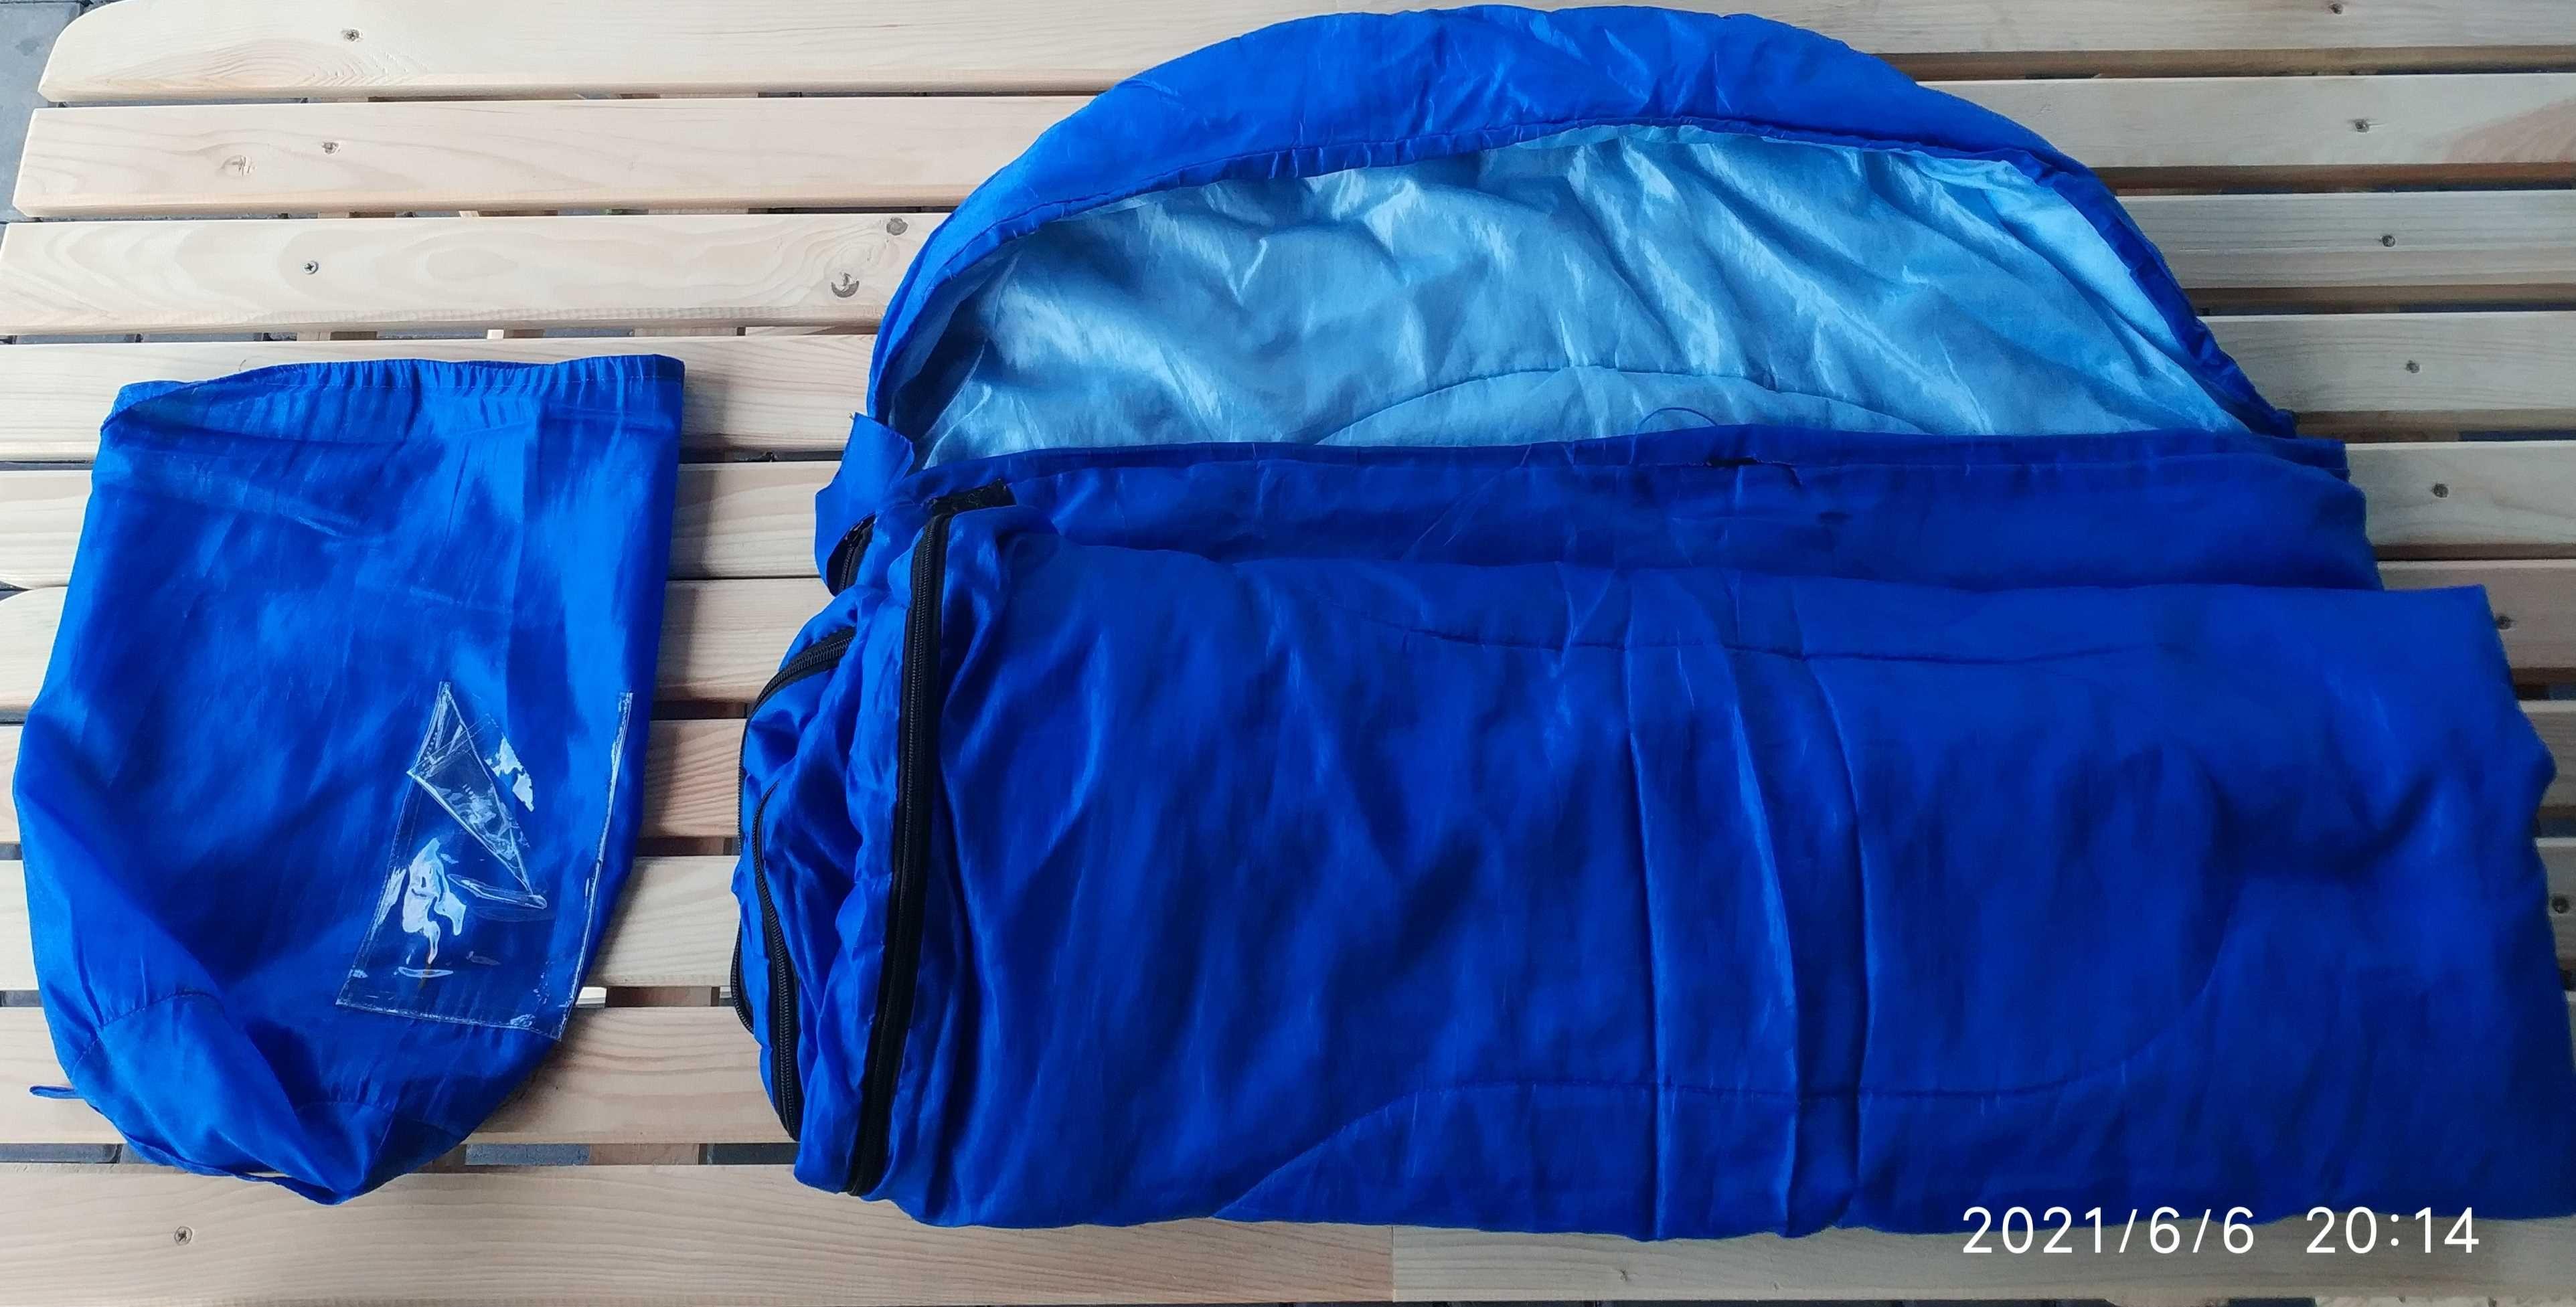 Śpiwór niebieski pod namiot kemping biwak plaża 180x70